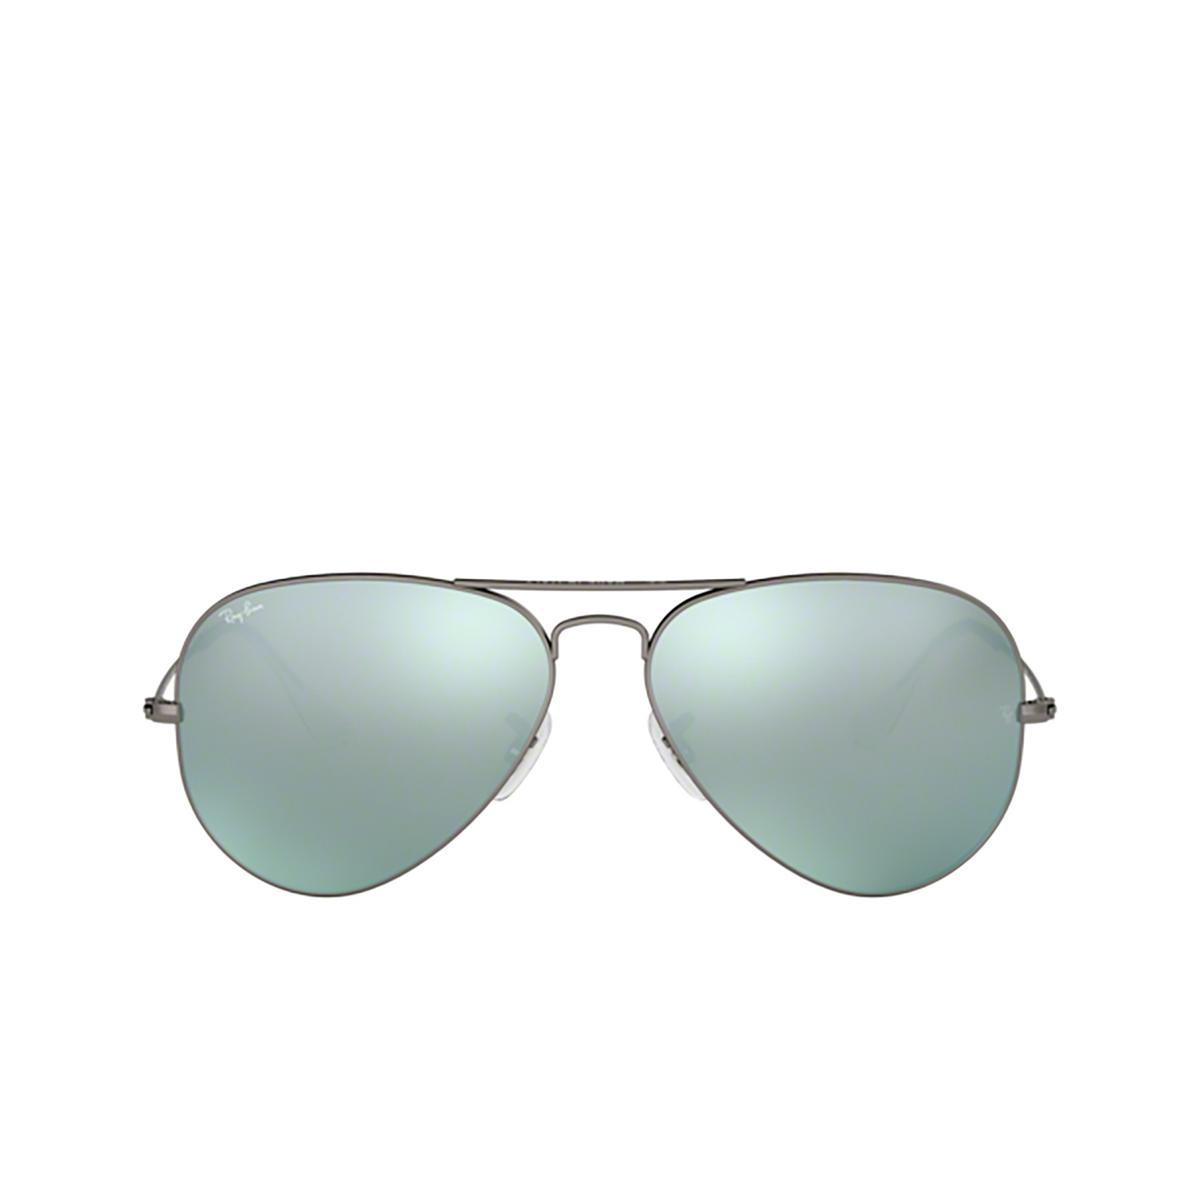 Ray-Ban® Aviator Sunglasses: Aviator Large Metal RB3025 color Matte Gunmetal 029/30 - front view.